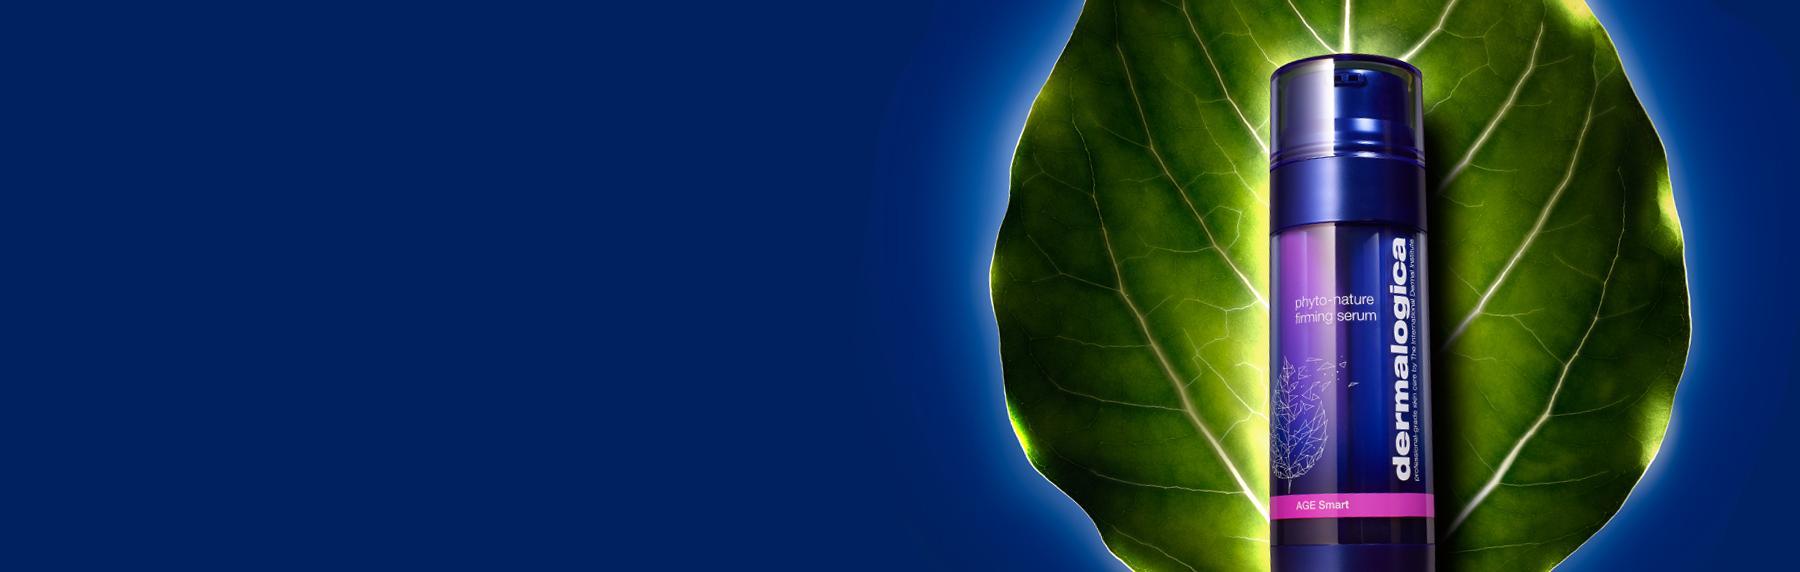 Phyto-nature firming serum - BENL